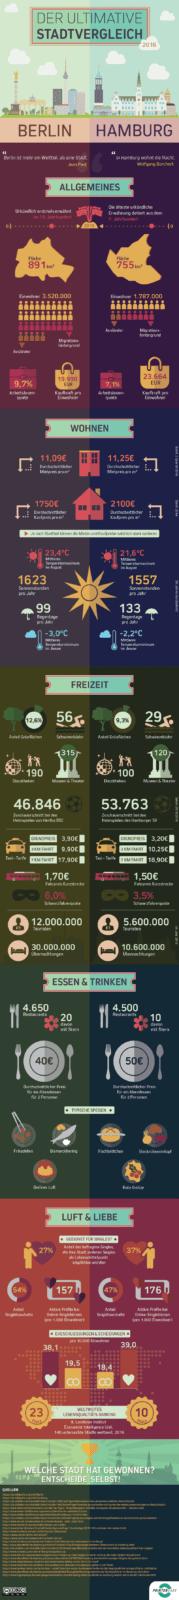 Stadtvergleich Berlin vs. Hamburg